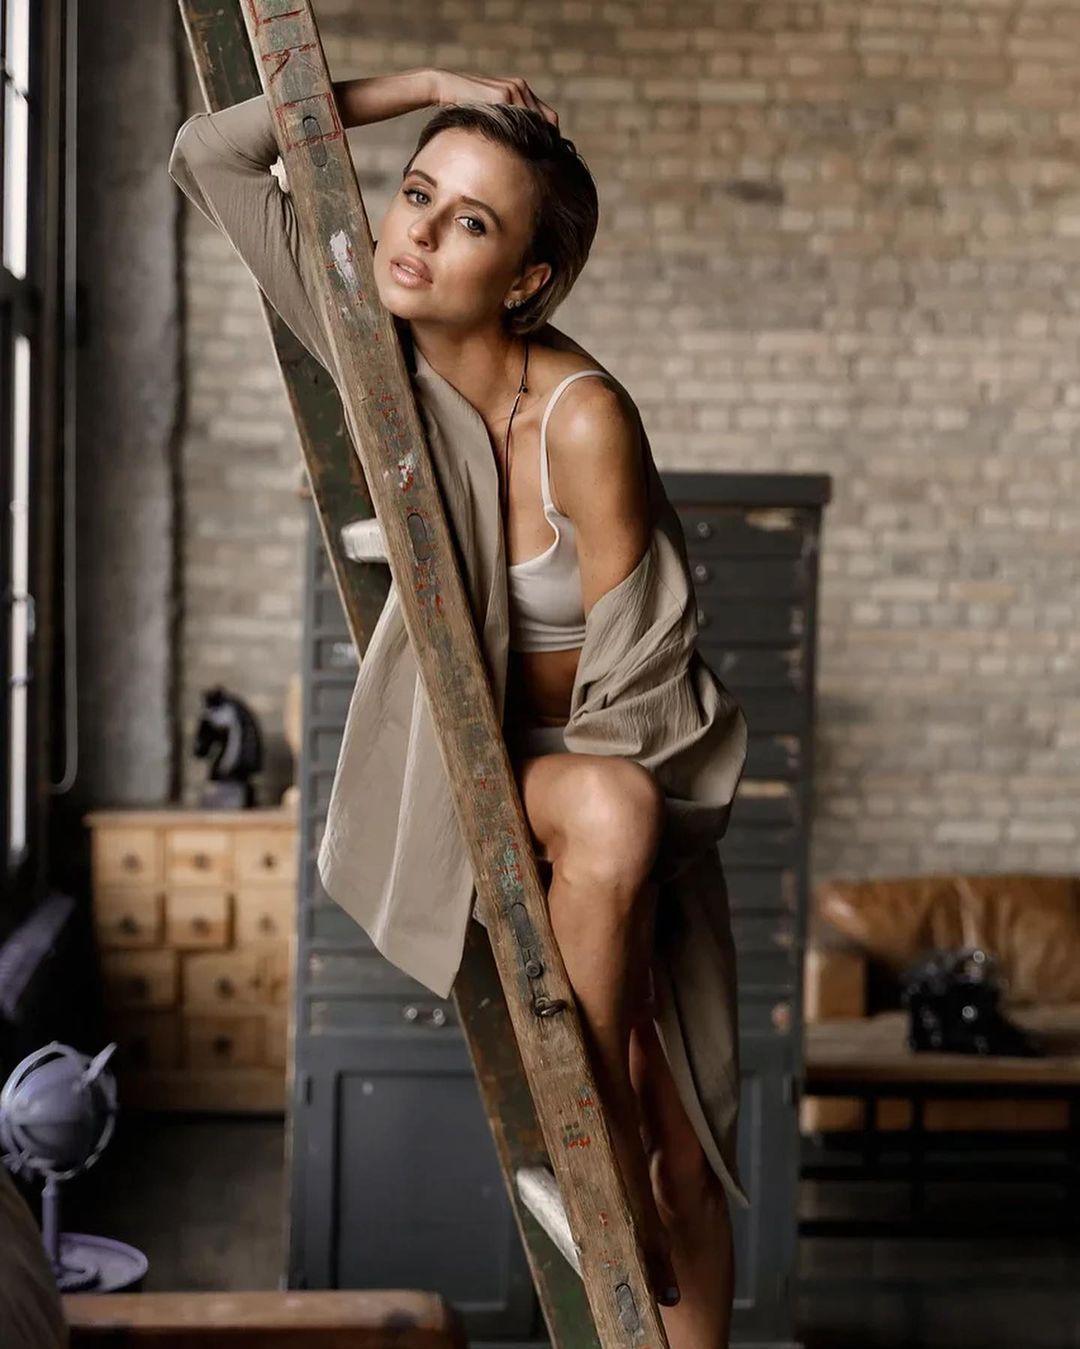 Мирослава Карпович сильно схудла / фото instagram.com/m1r0slava_karpovich